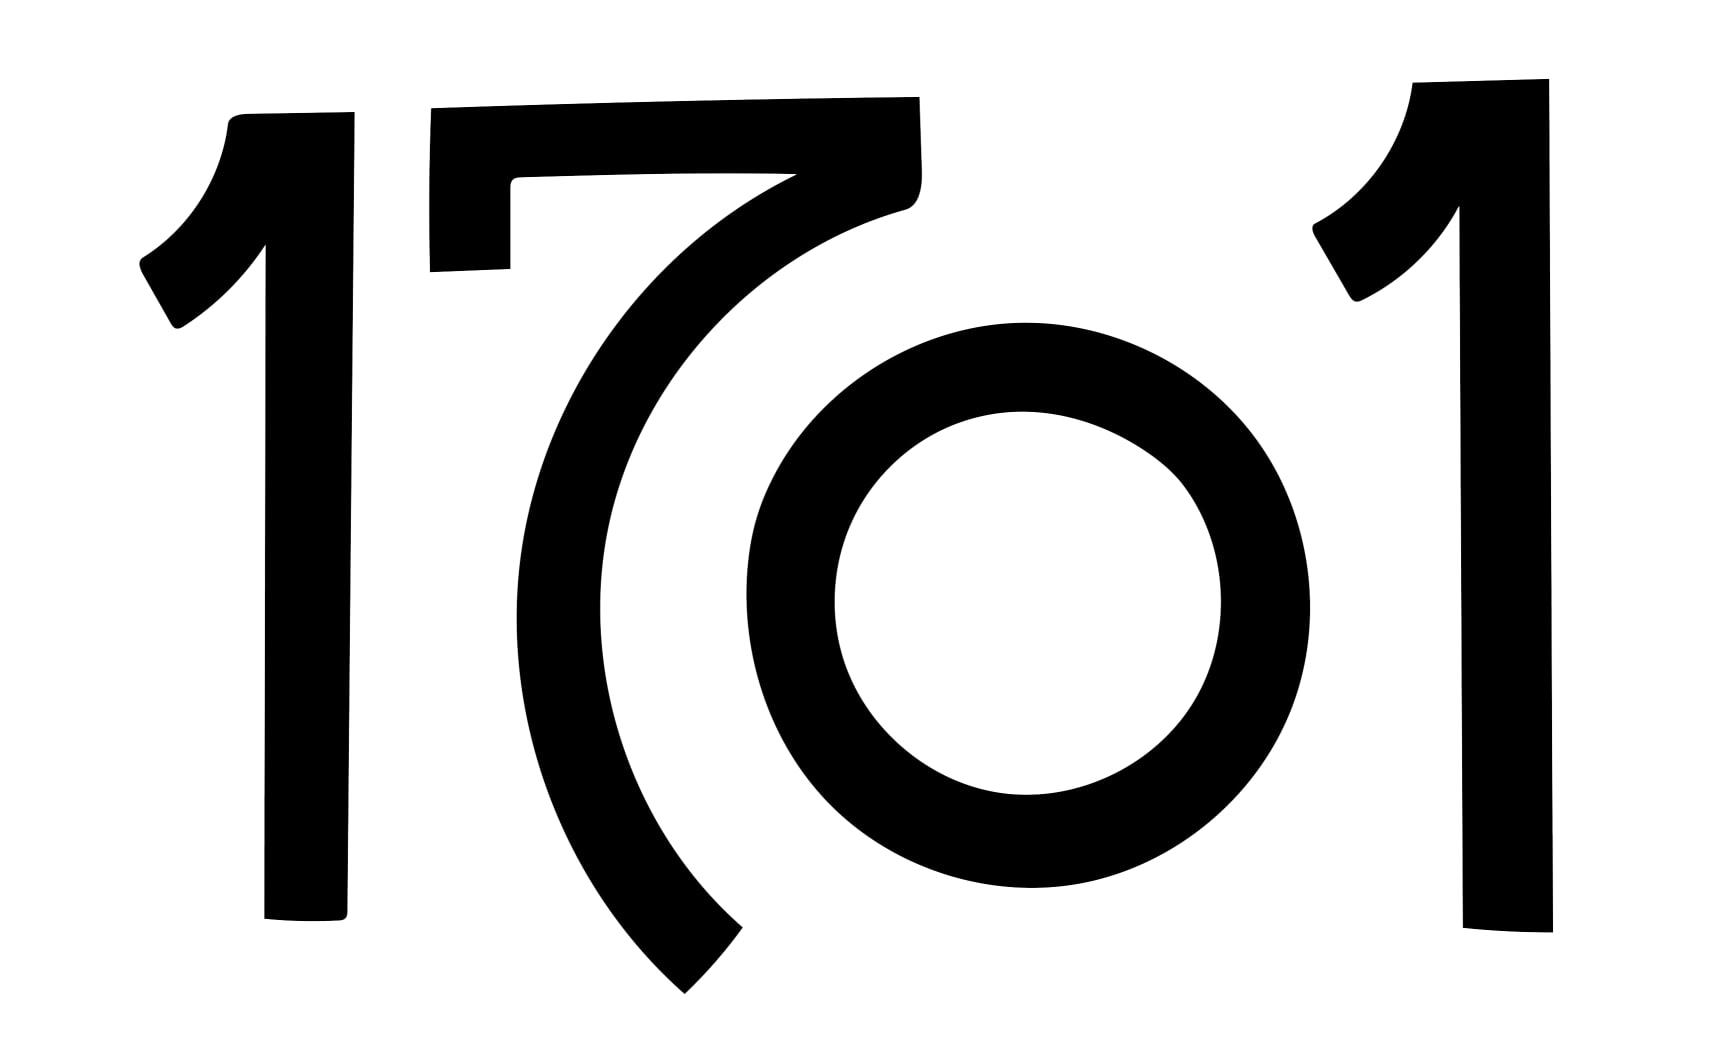 1701-logo.jpg